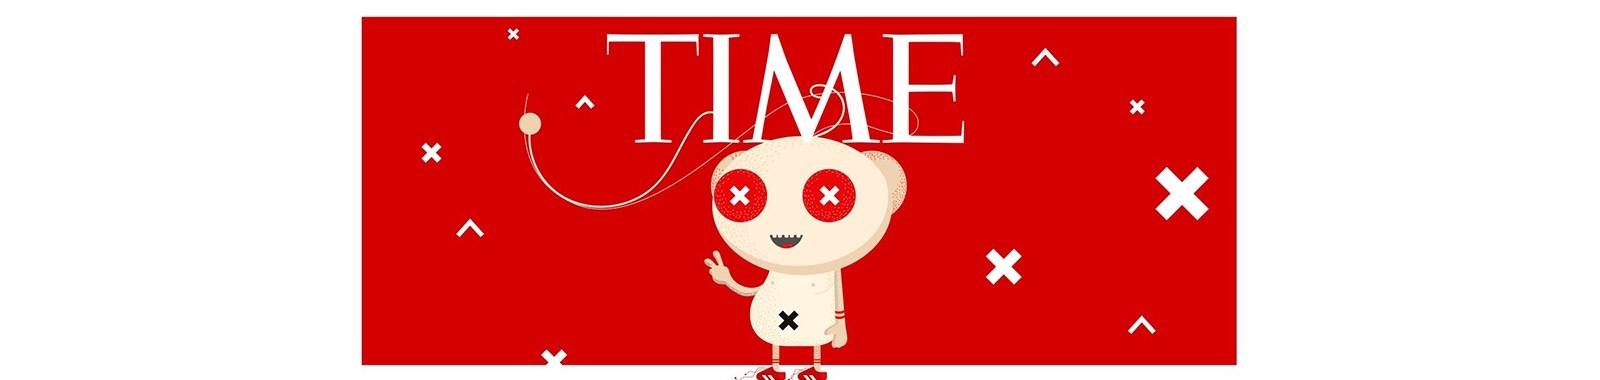 Time-x-Reddit-mainer-eye